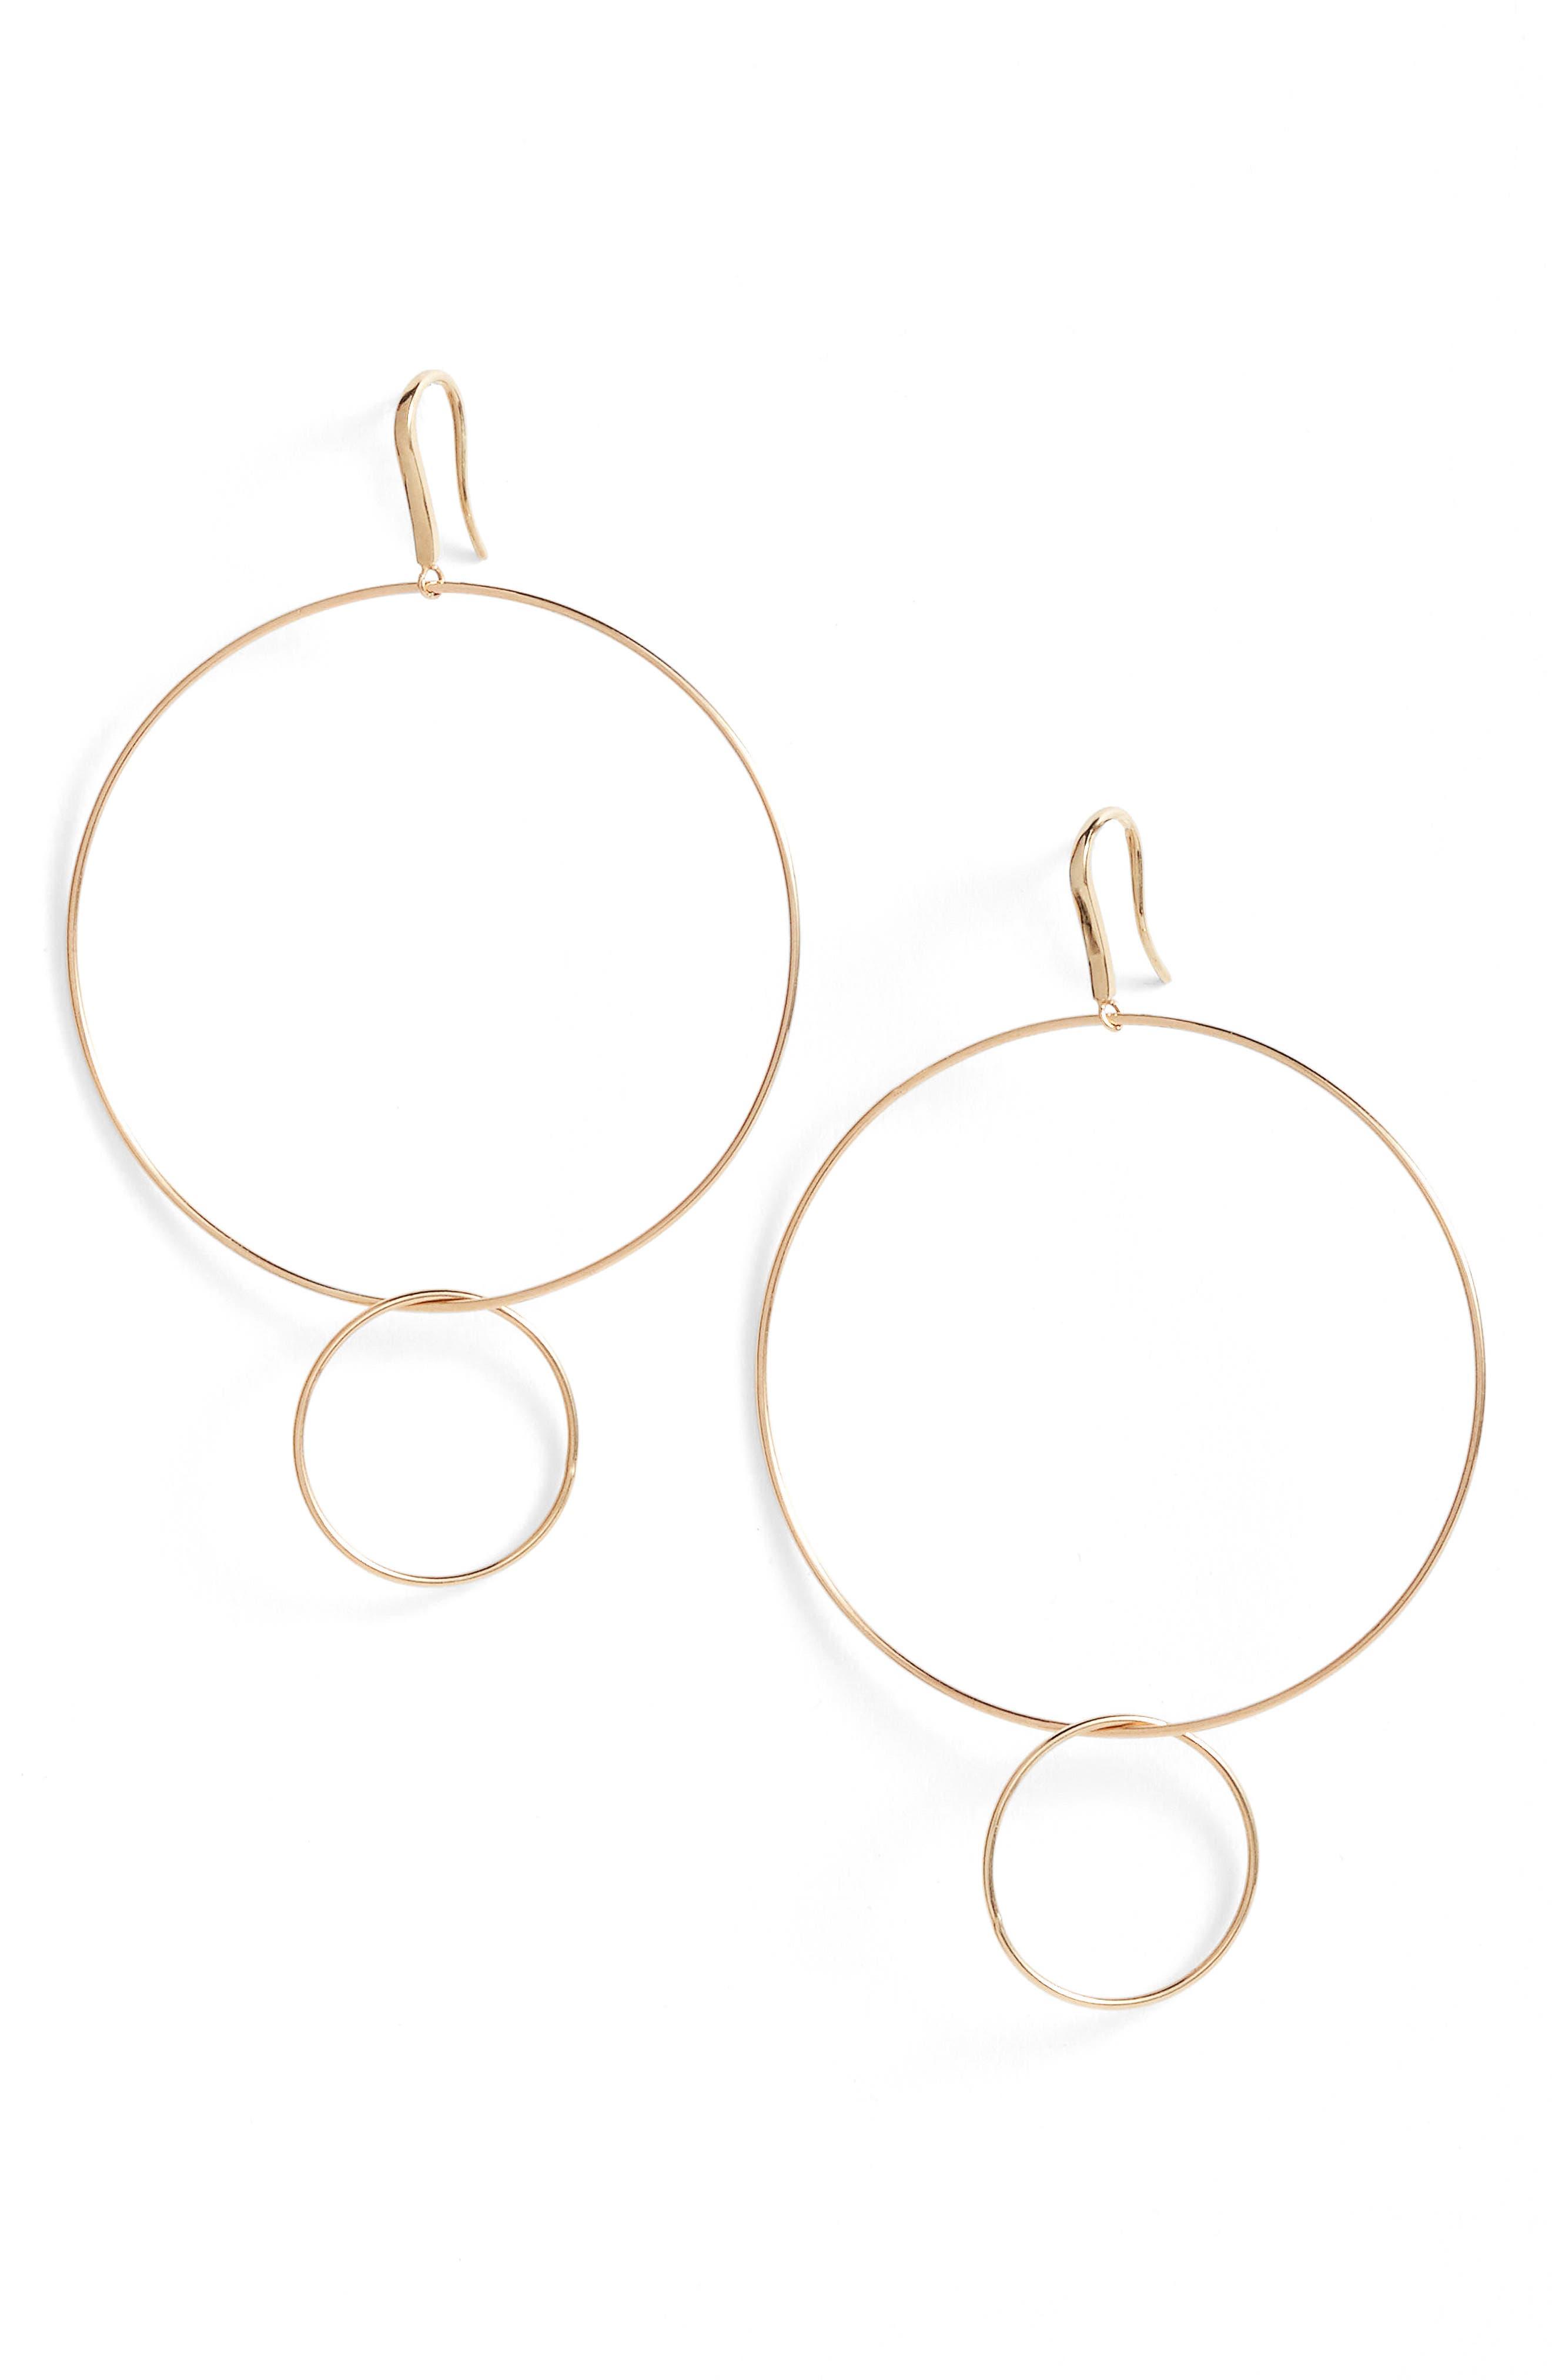 Main Image - Lana Jewelry Frontal Hoop Earrings